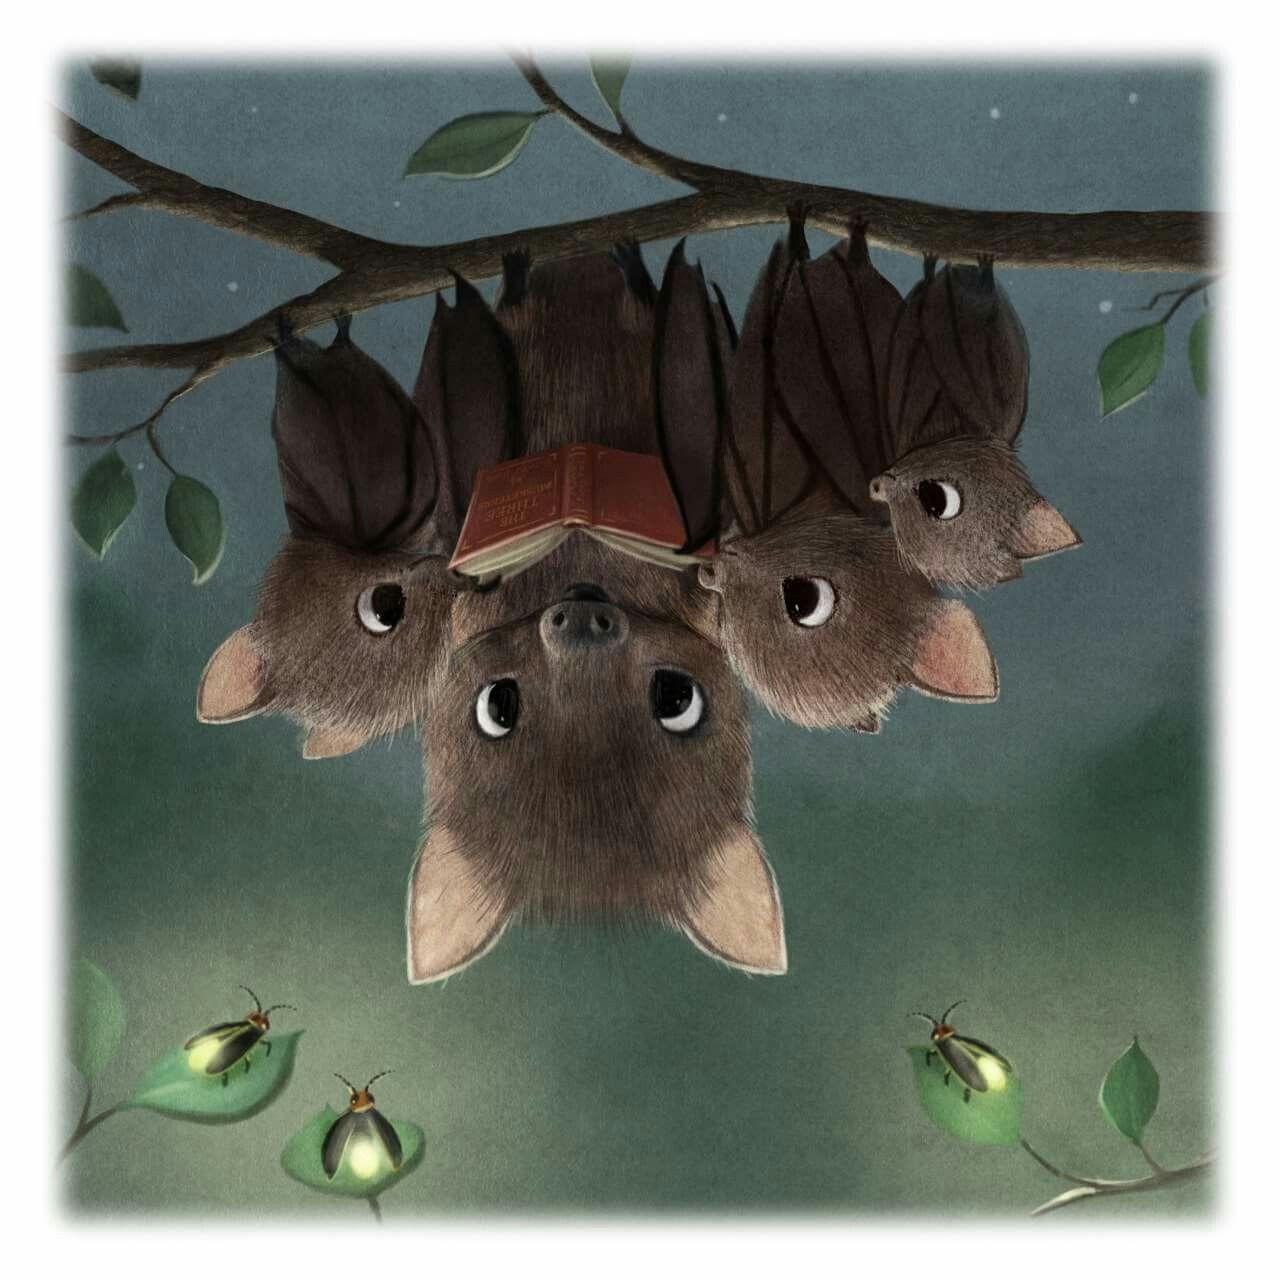 Word Nerd Cute animal illustration, Cute animal drawings